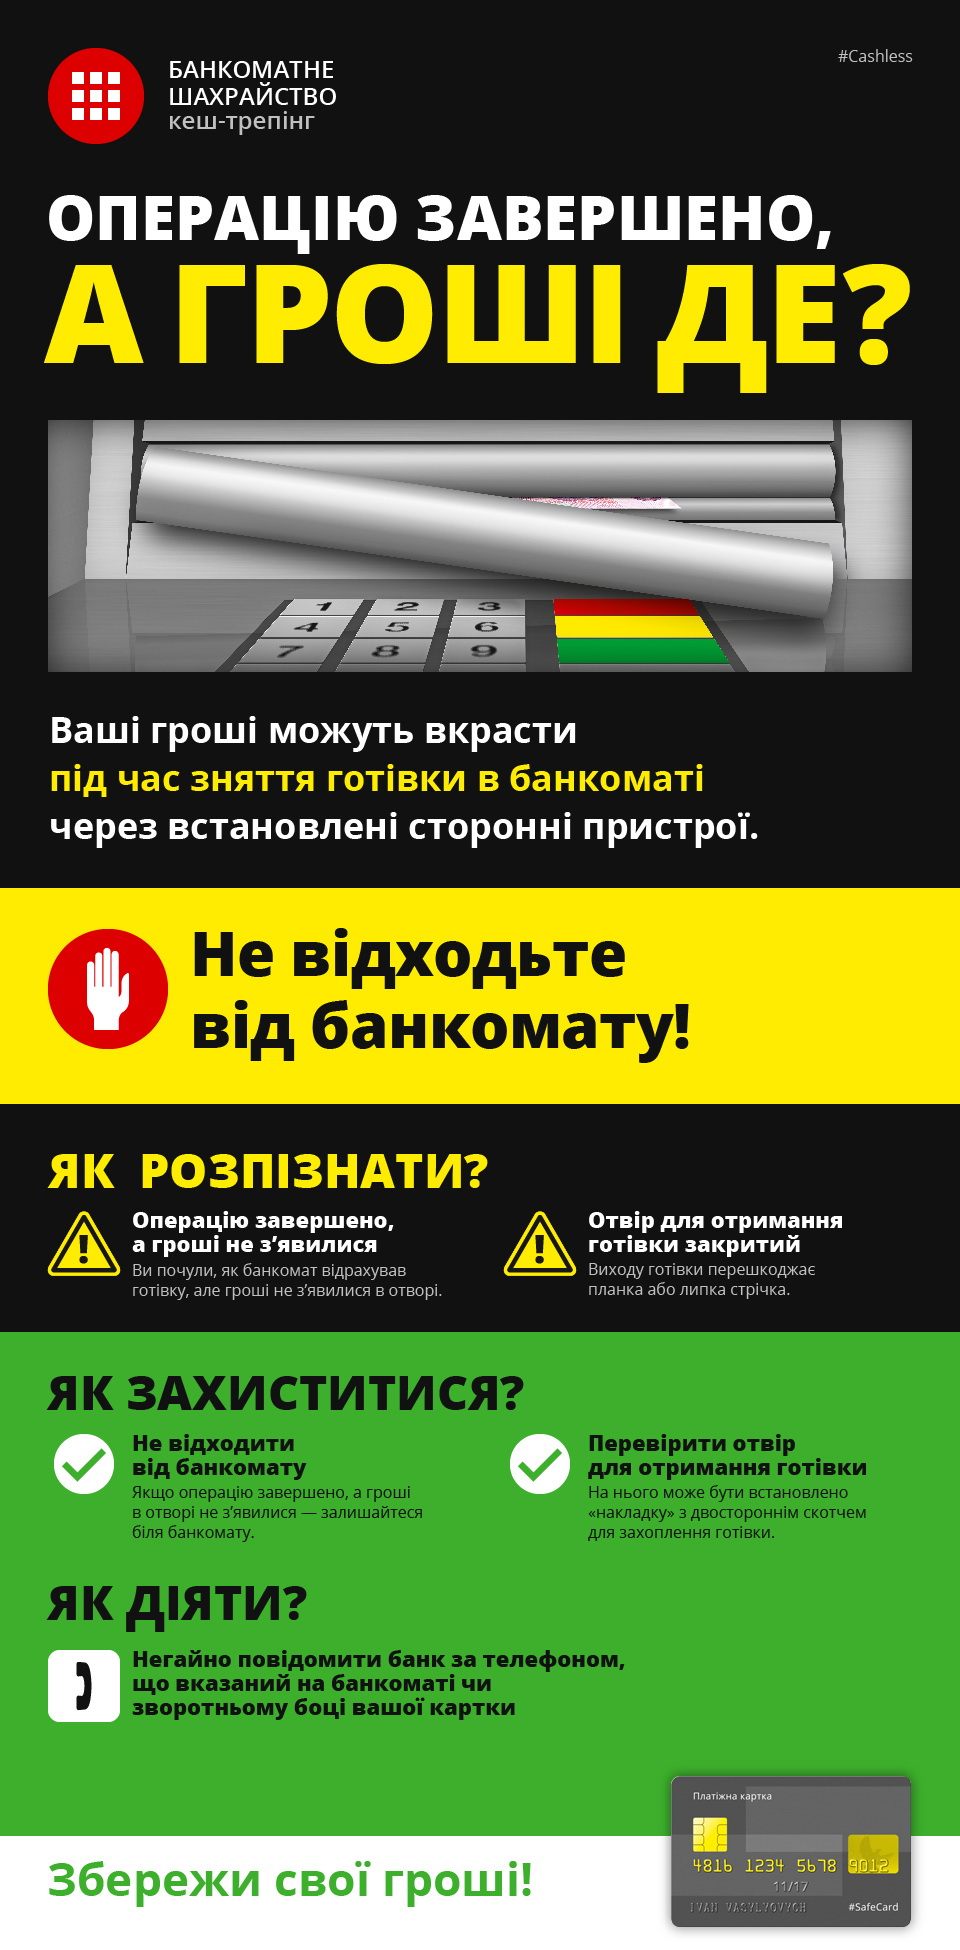 Кеш-триппинг инфографика